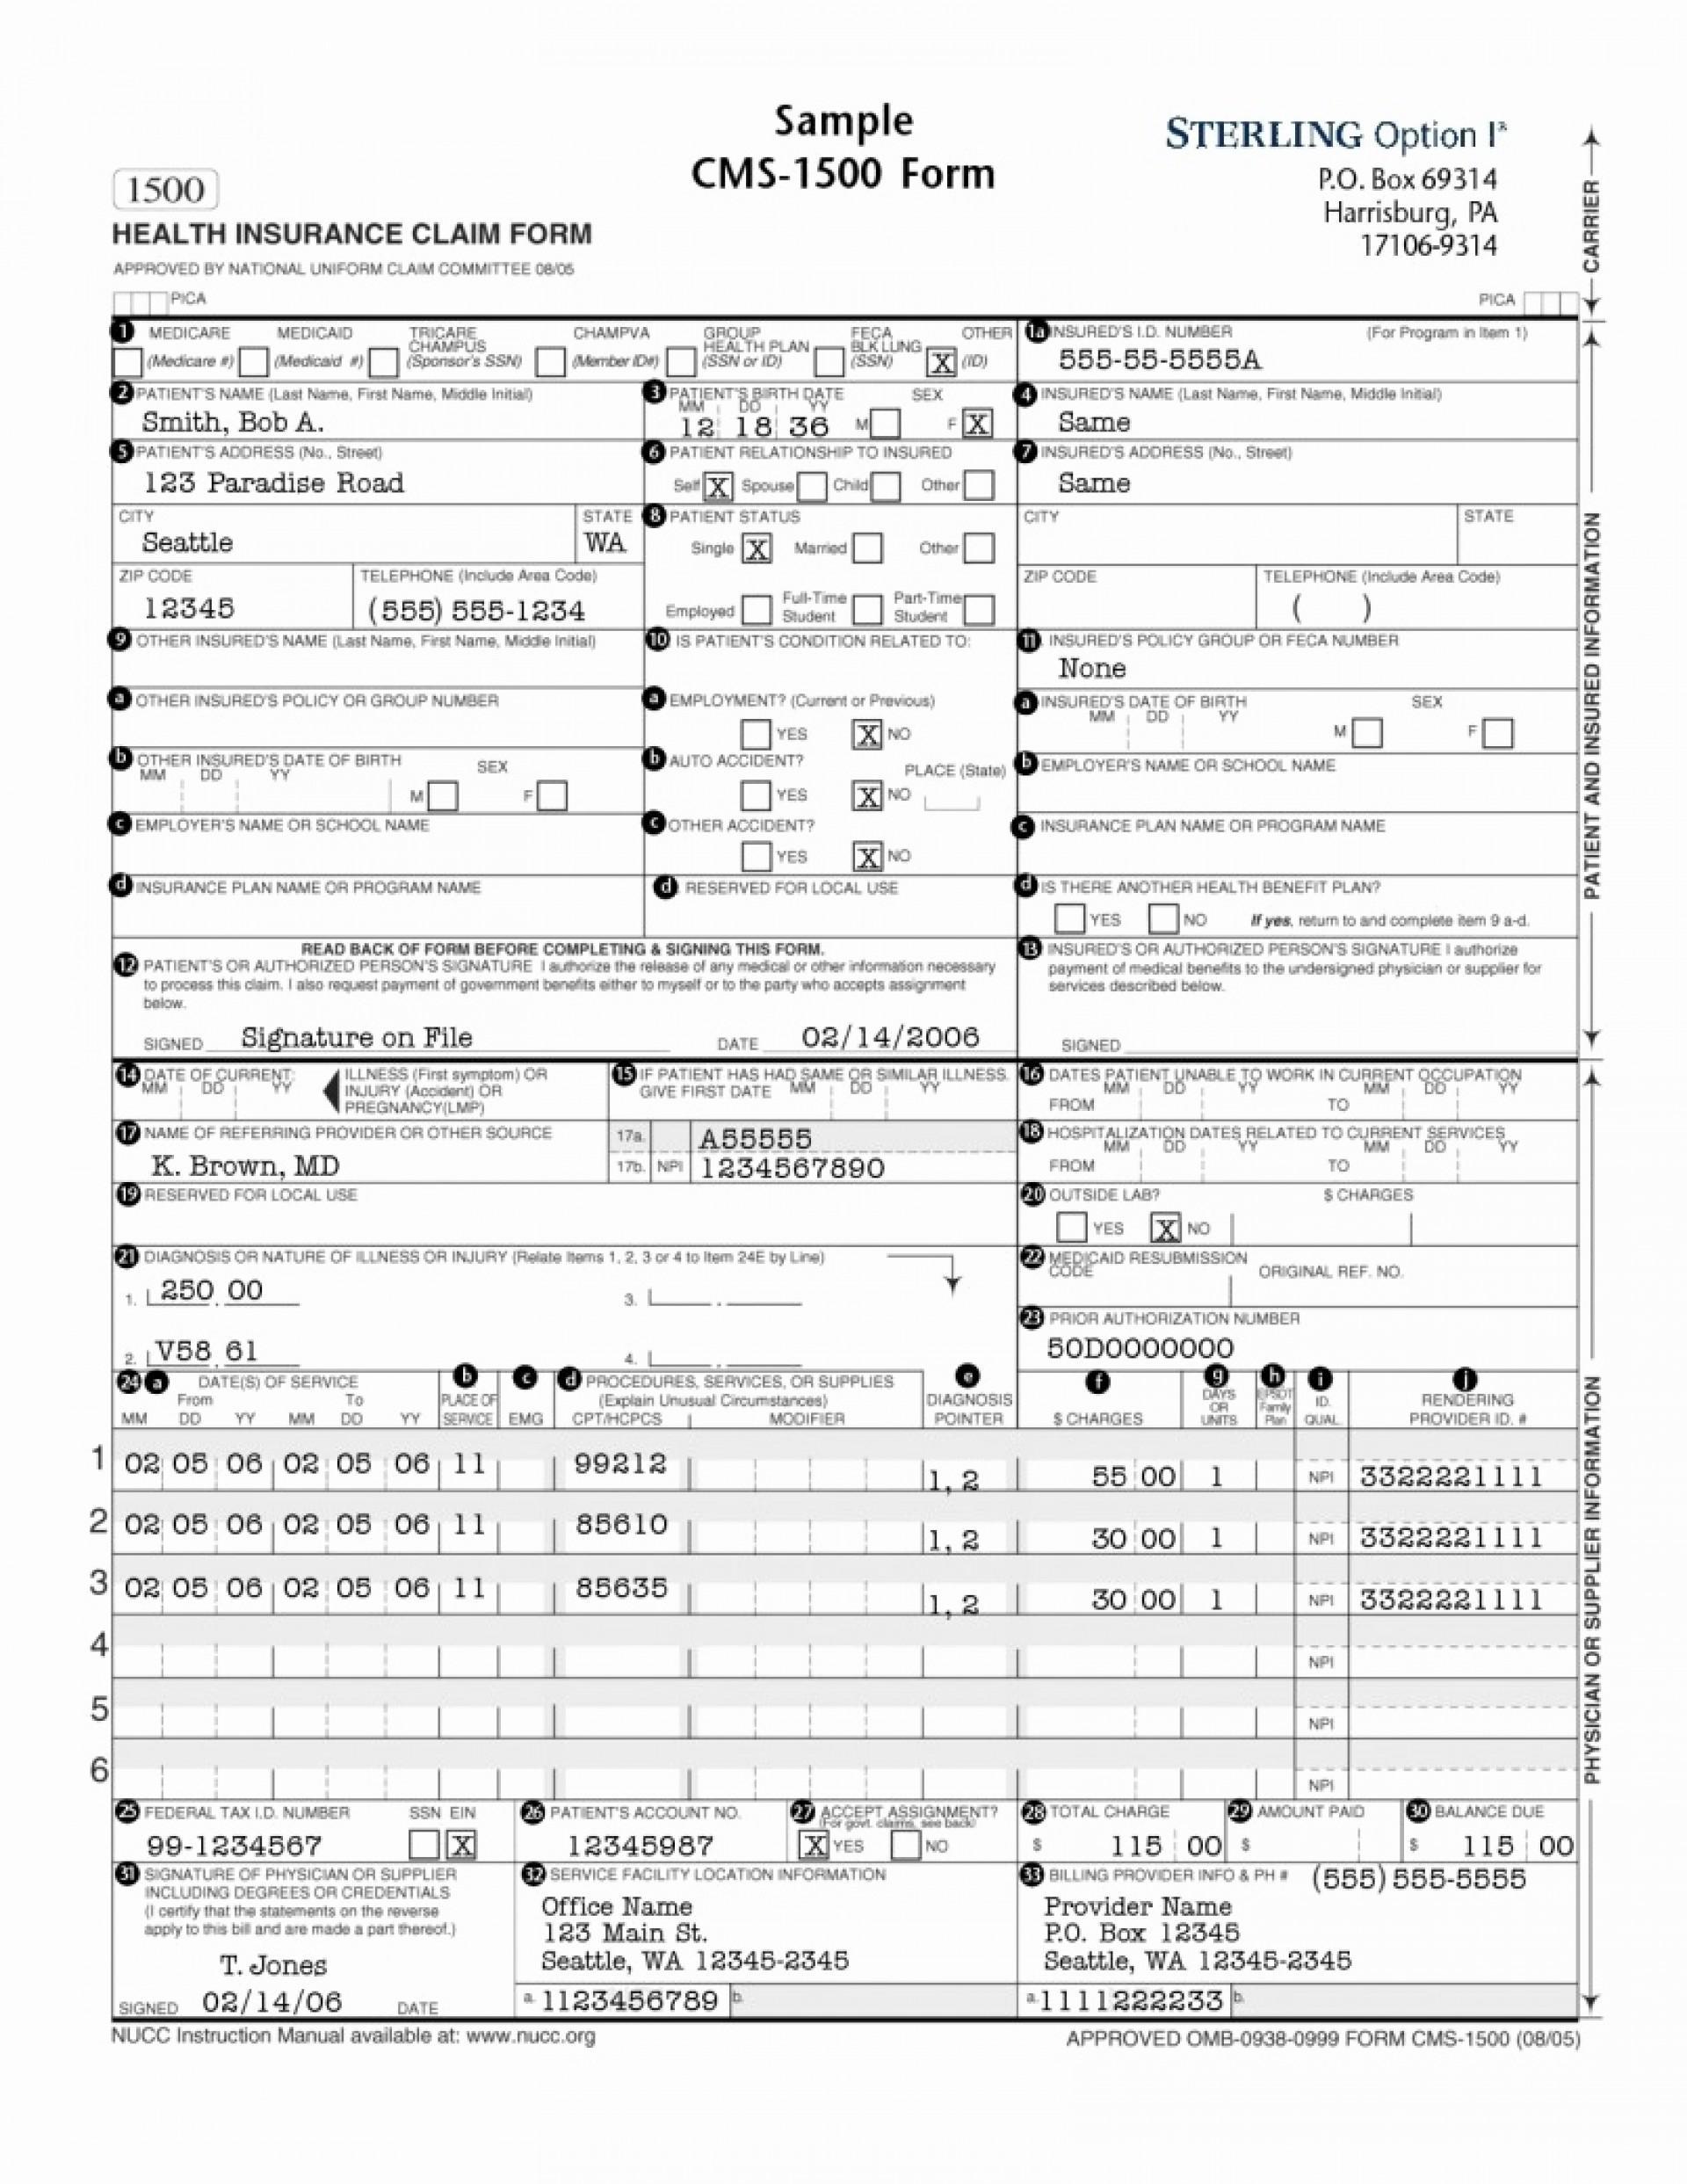 1500 Health Insurance Claim Form Software